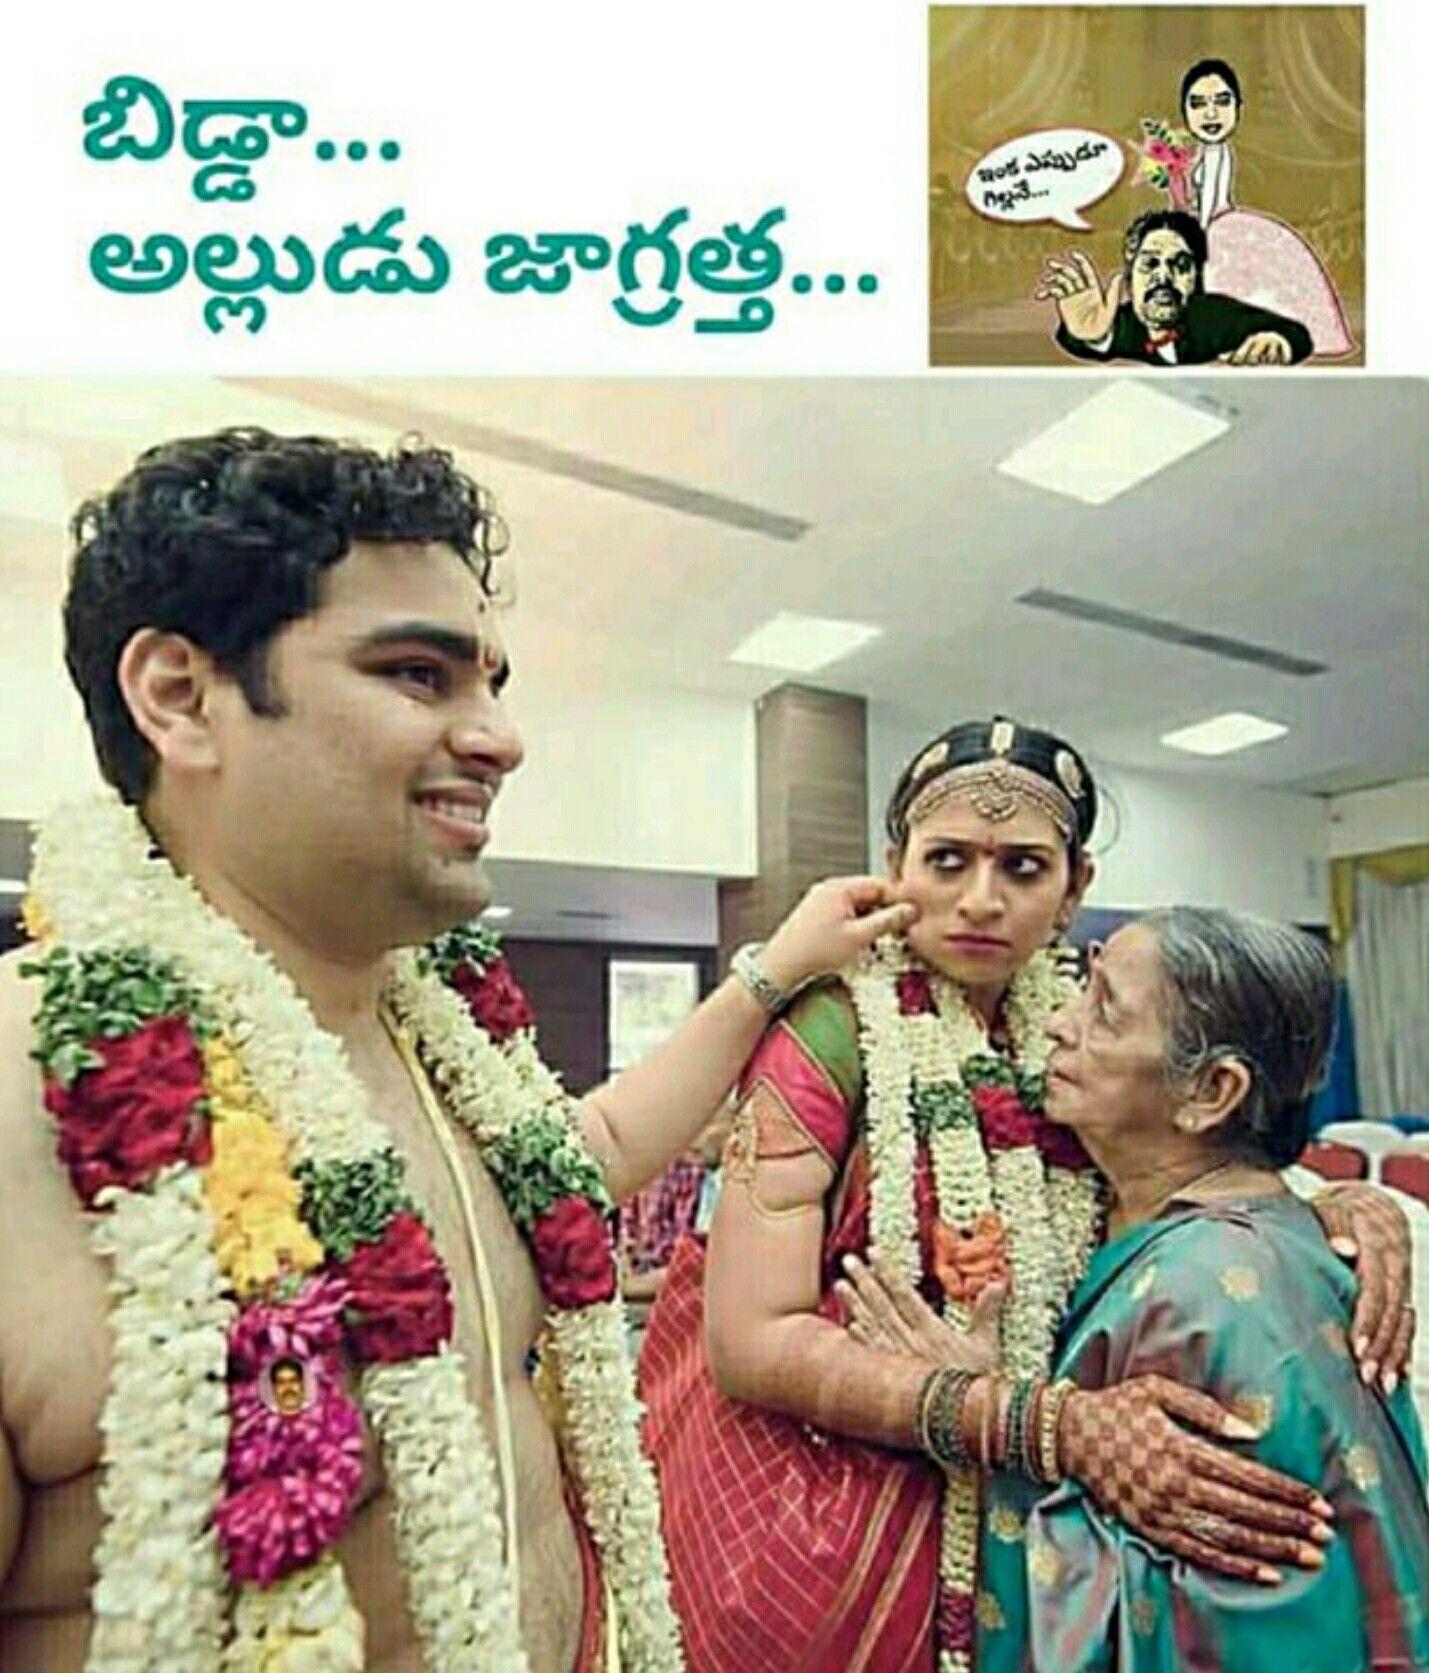 Pin by Raghavendra Murari on ఫన్నీ Funny images, Telugu